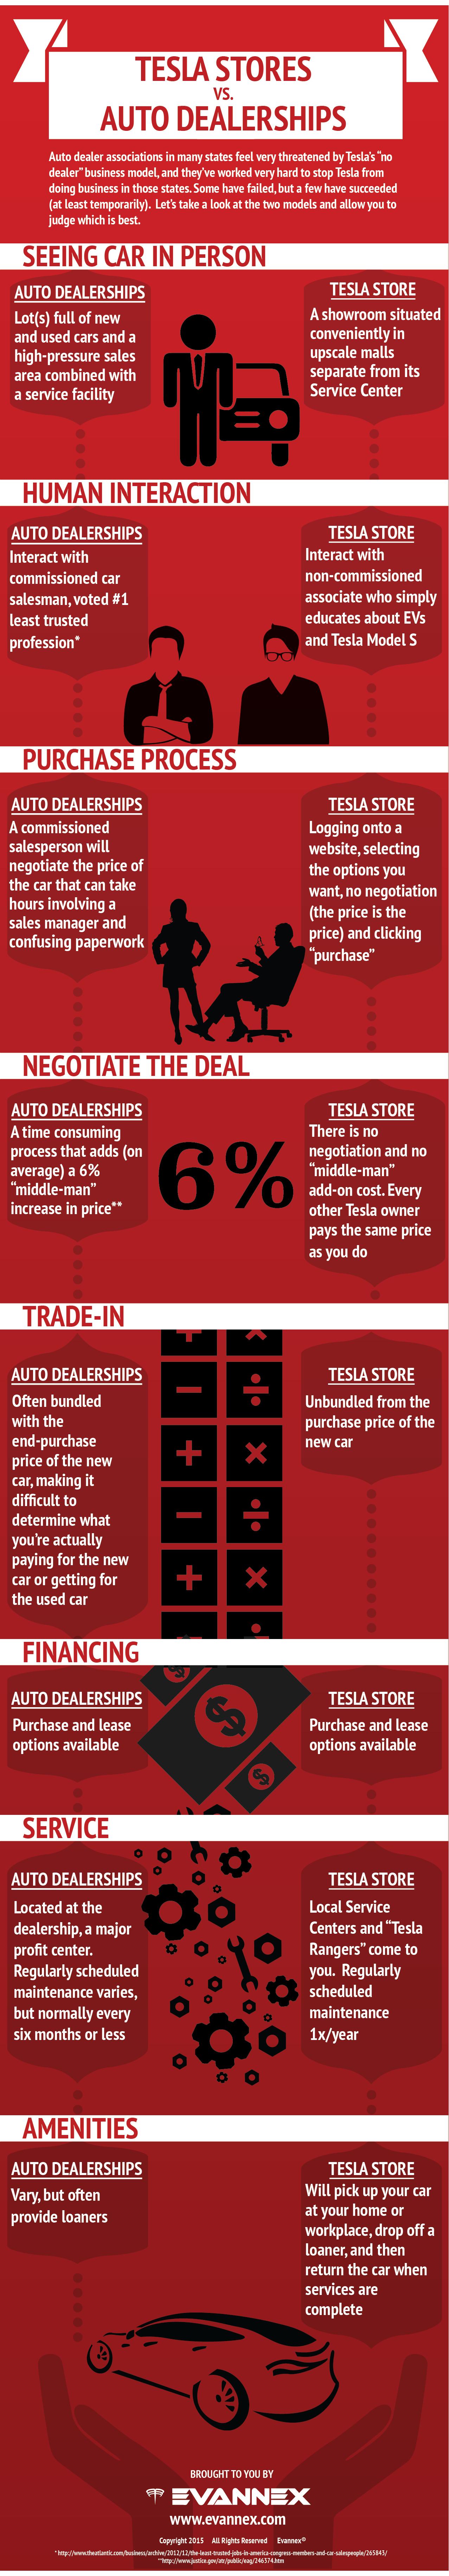 Tesla-Stores-vs-Auto-Dealerships